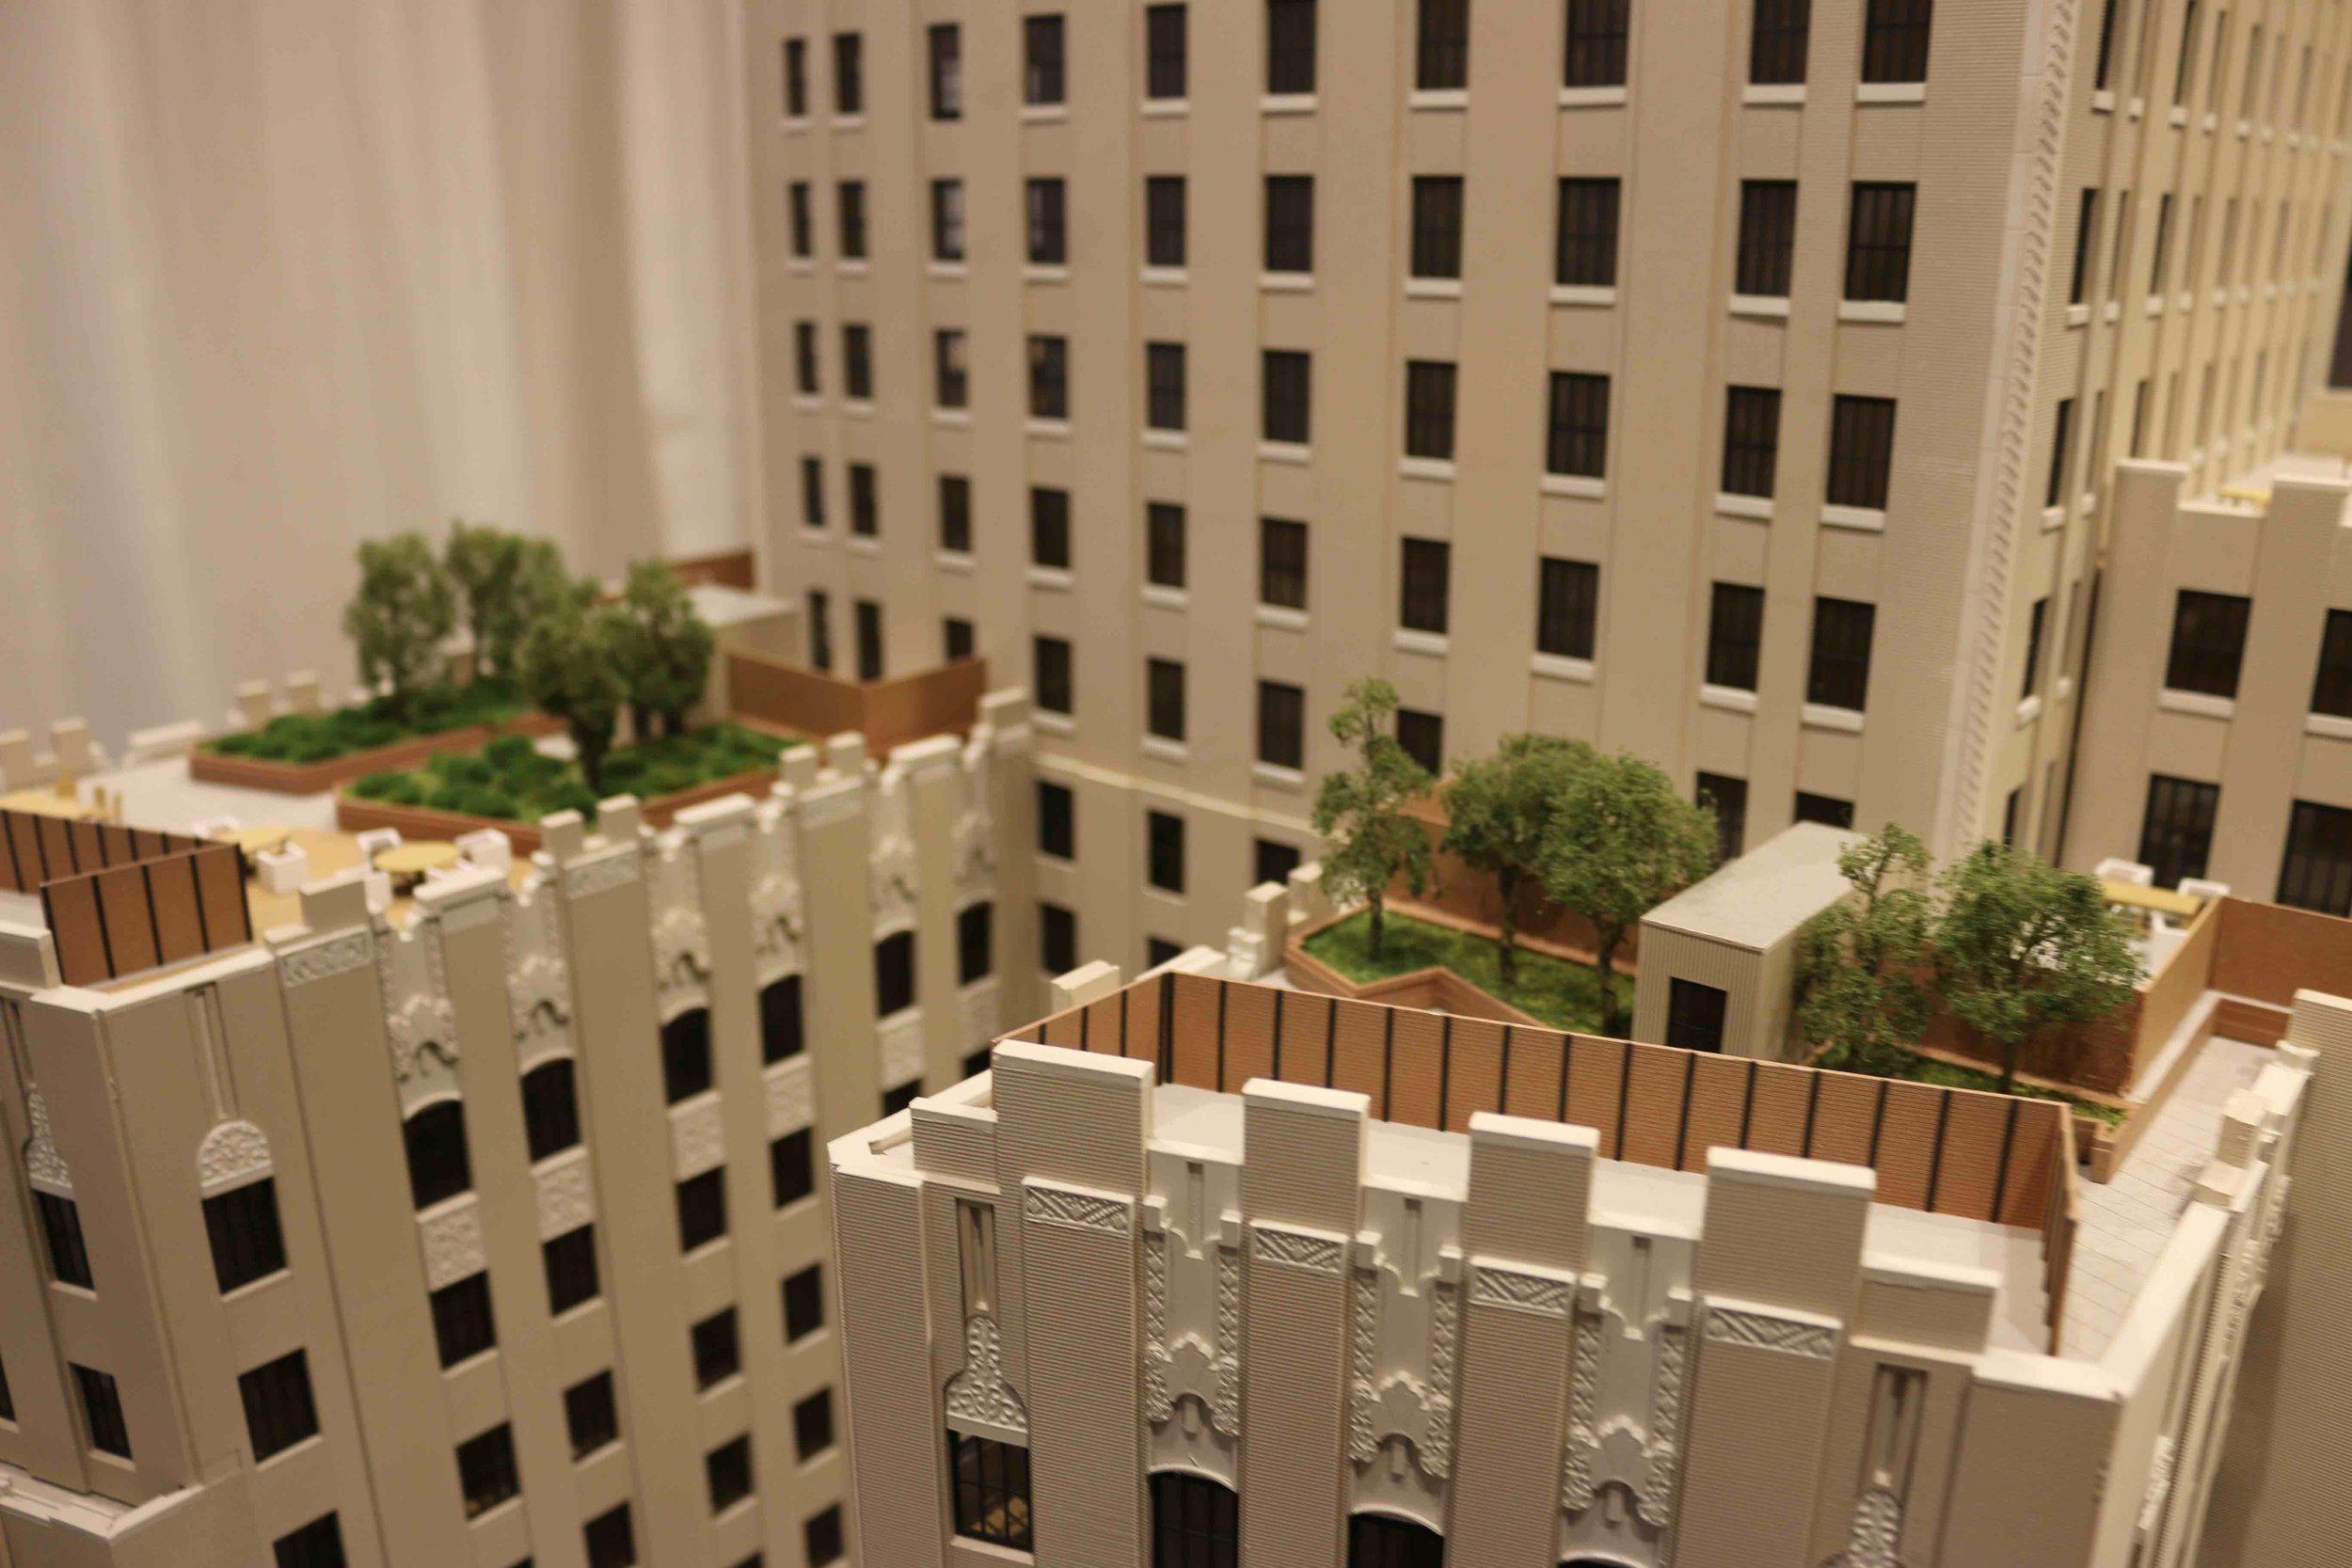 NYC Urbanism